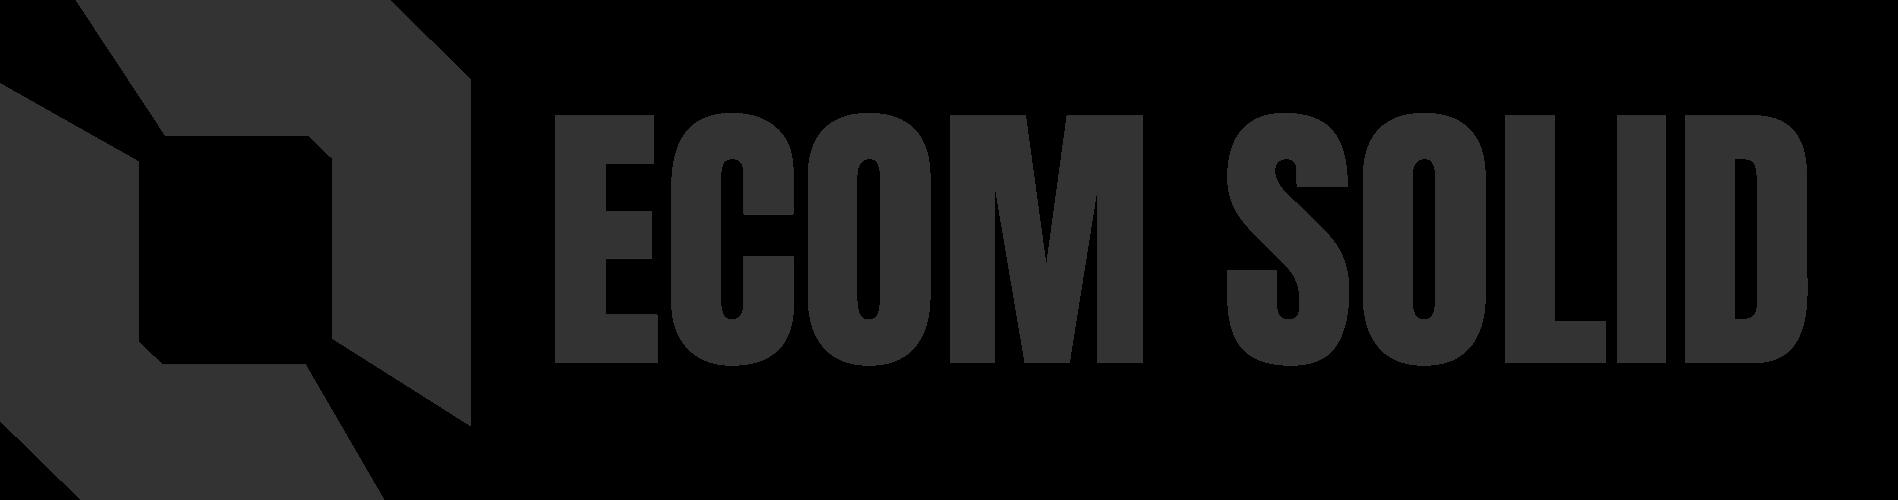 Logo%20Image%20Alt%20Text